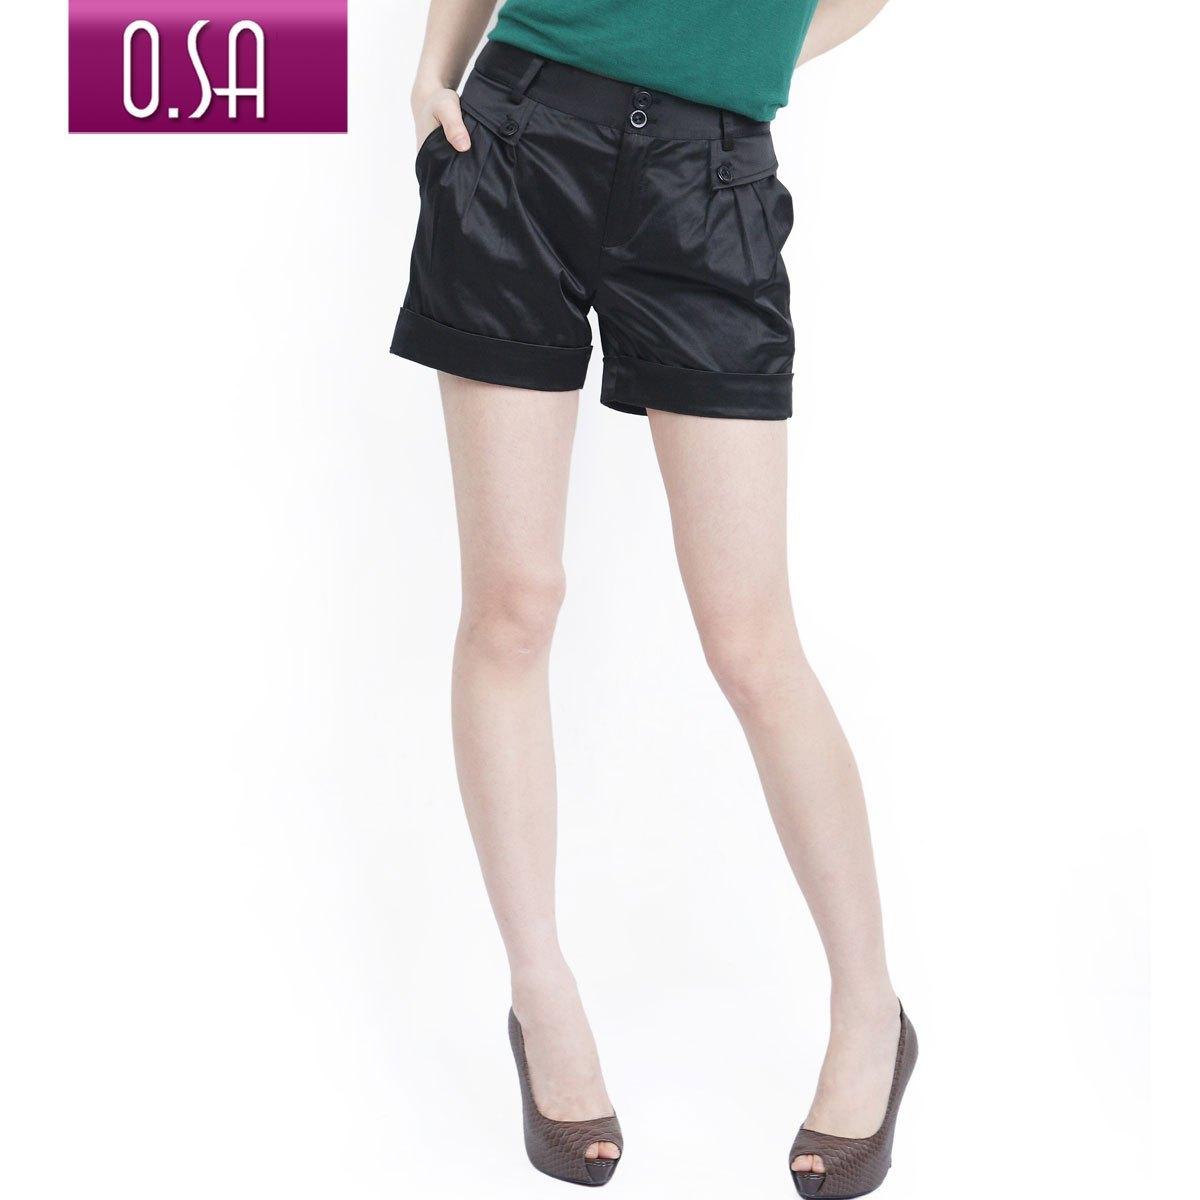 O.SA 2011 summer women's plus size loose casual summer shorts female k00209